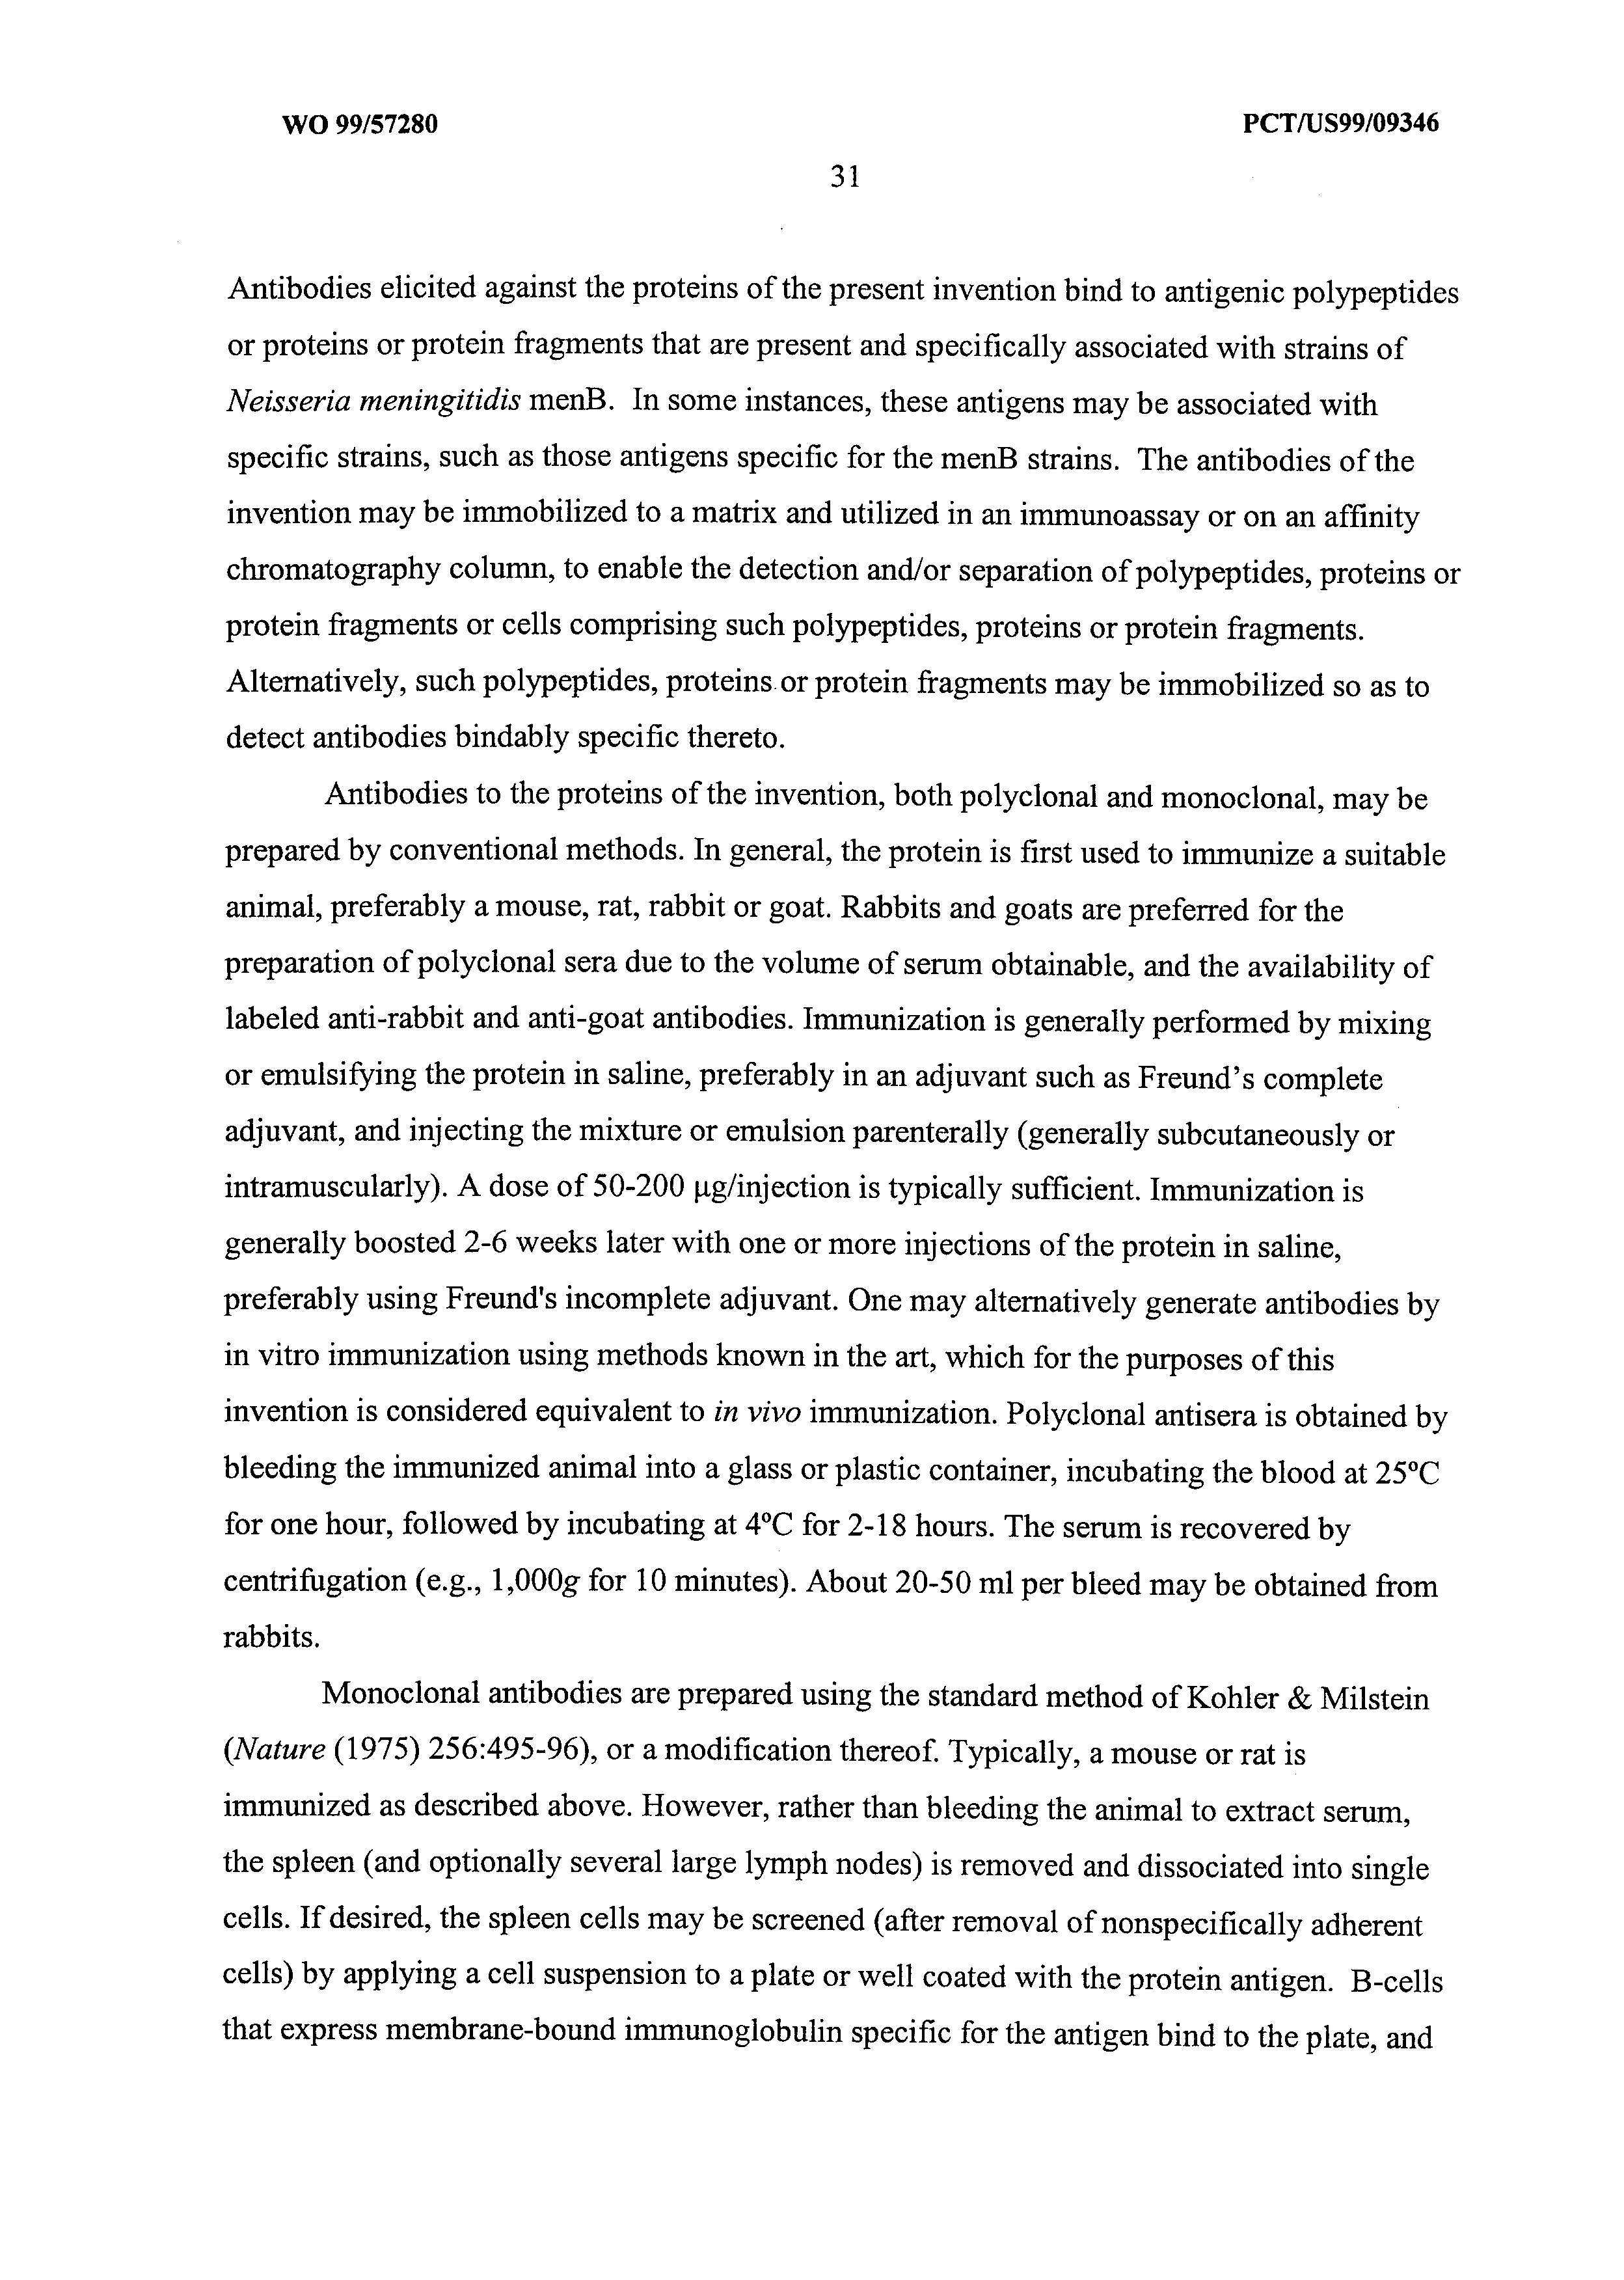 WO 1999/057280 A2 - Neisseria Meningitidis Antigens And